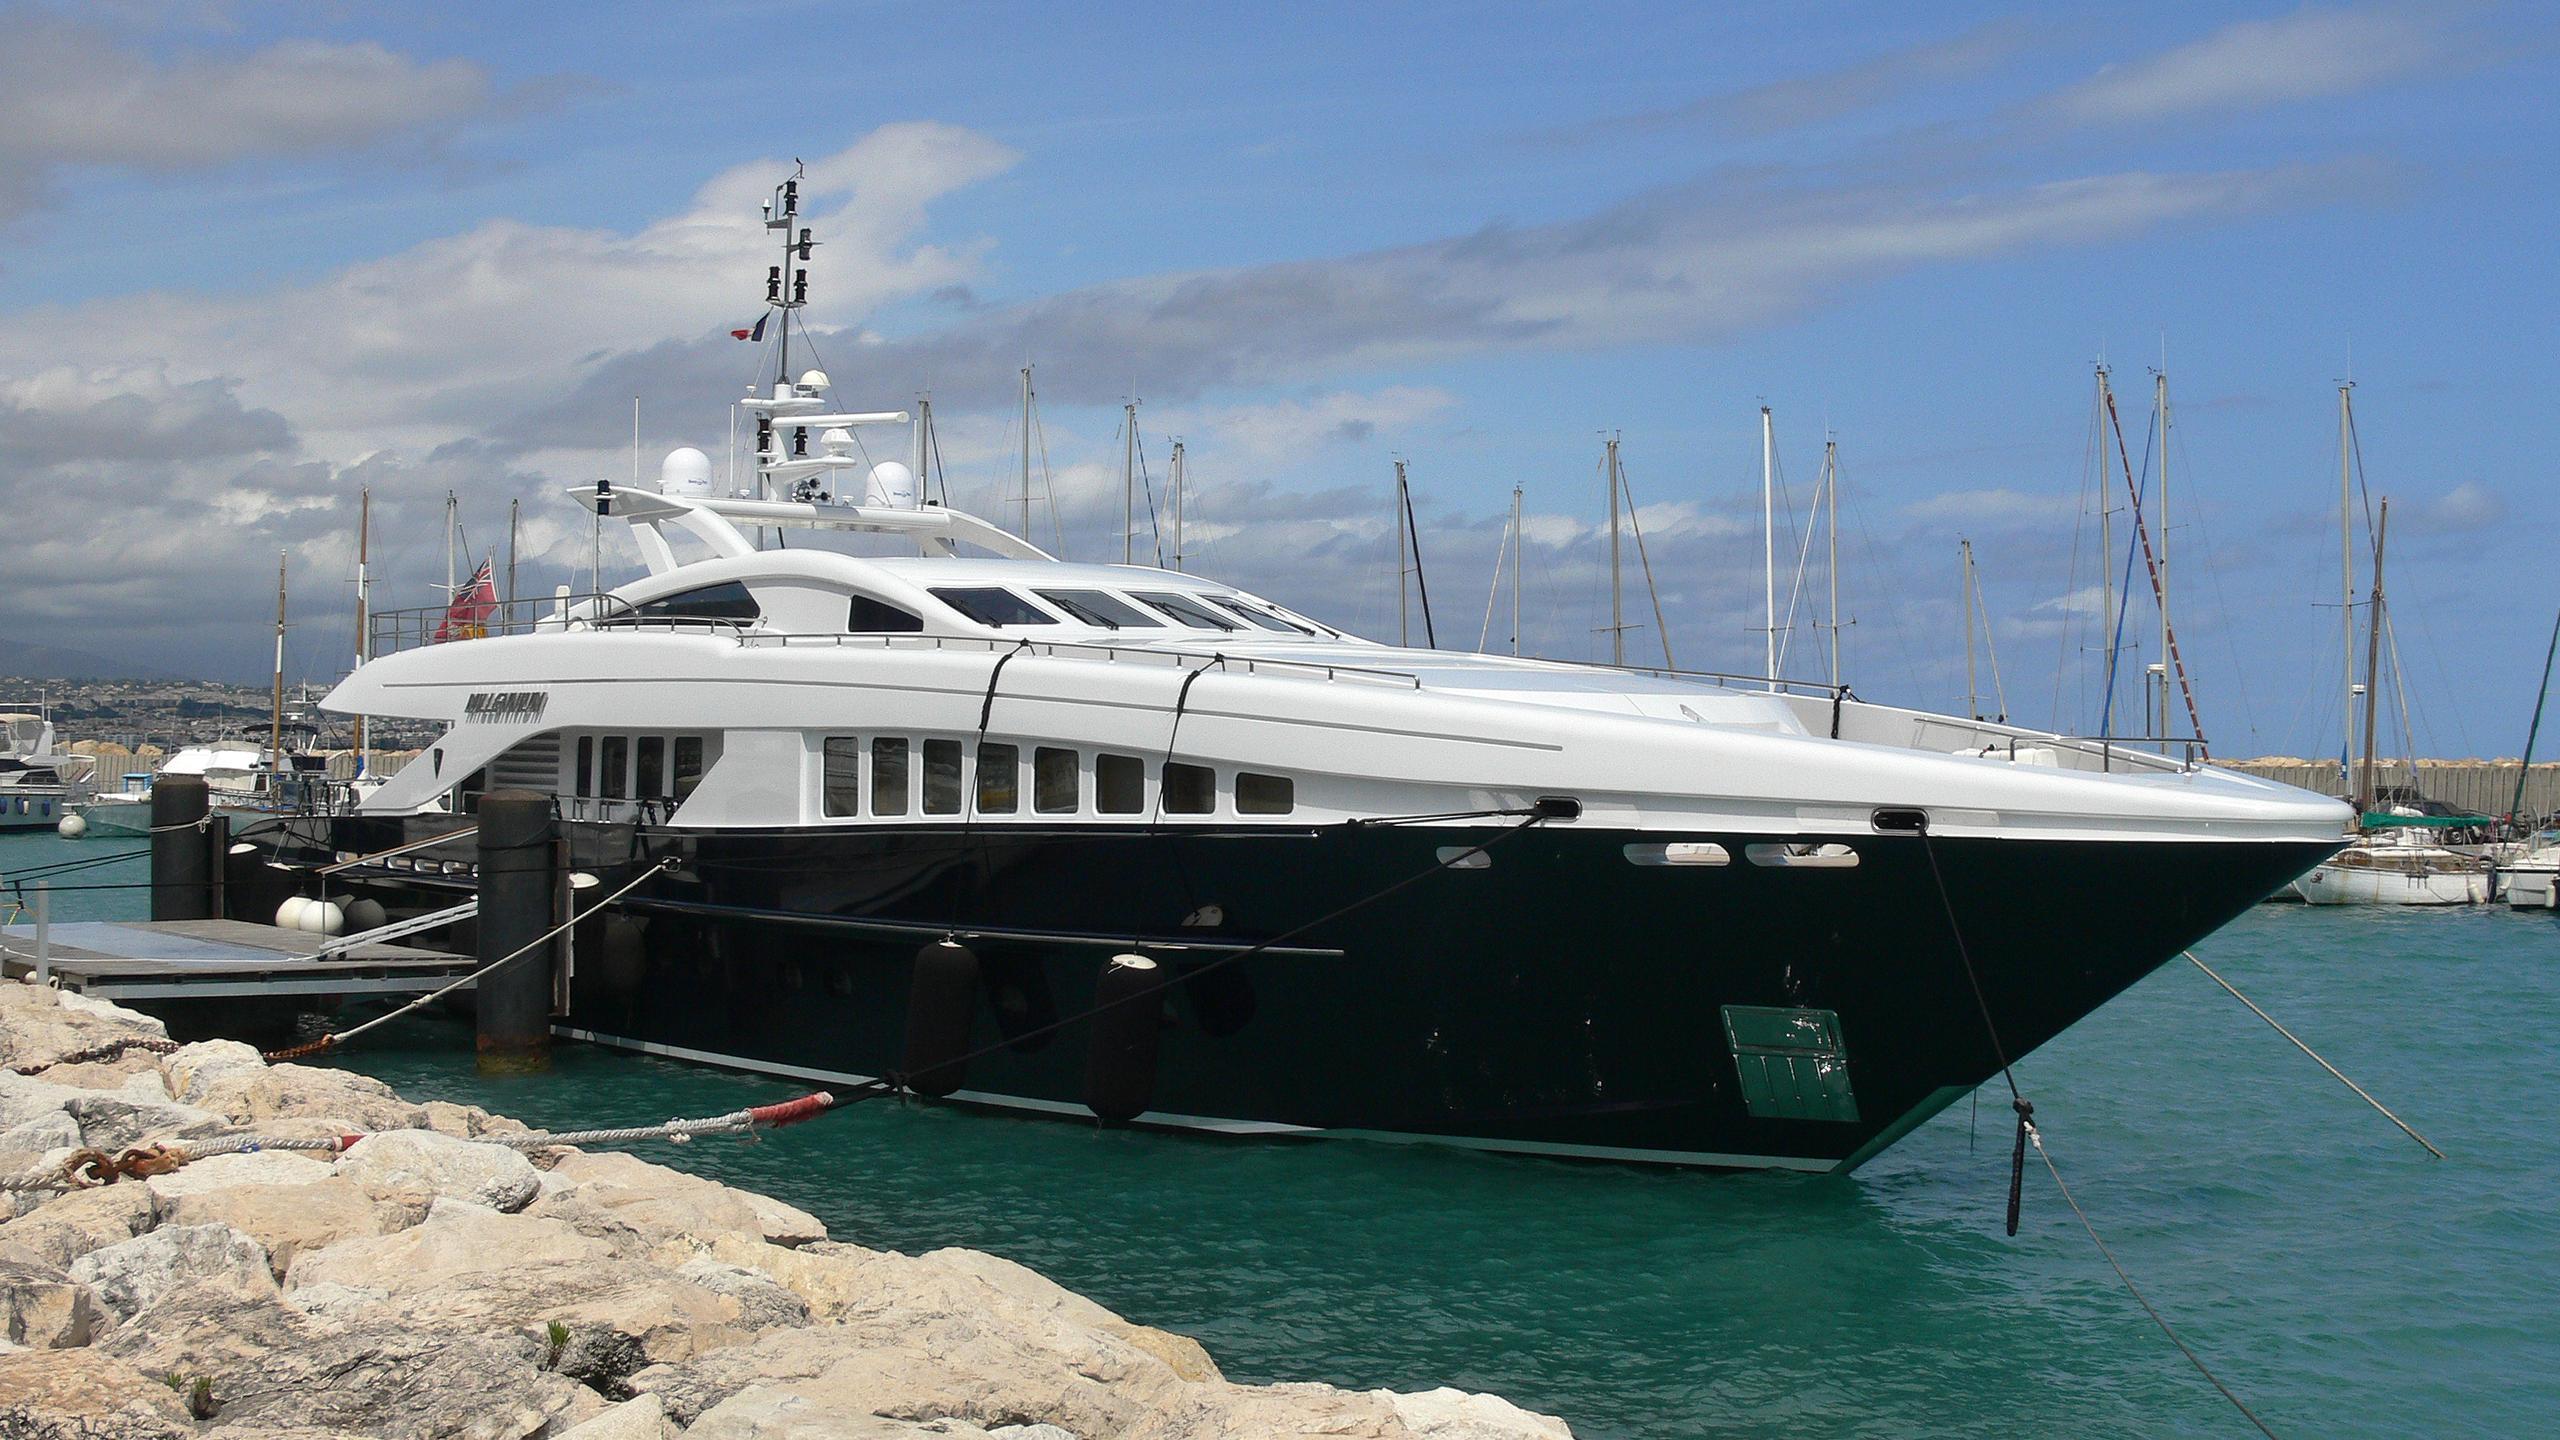 lequinox chrimi ii millennium motoryacht heesen yachts 2006 37m half profile